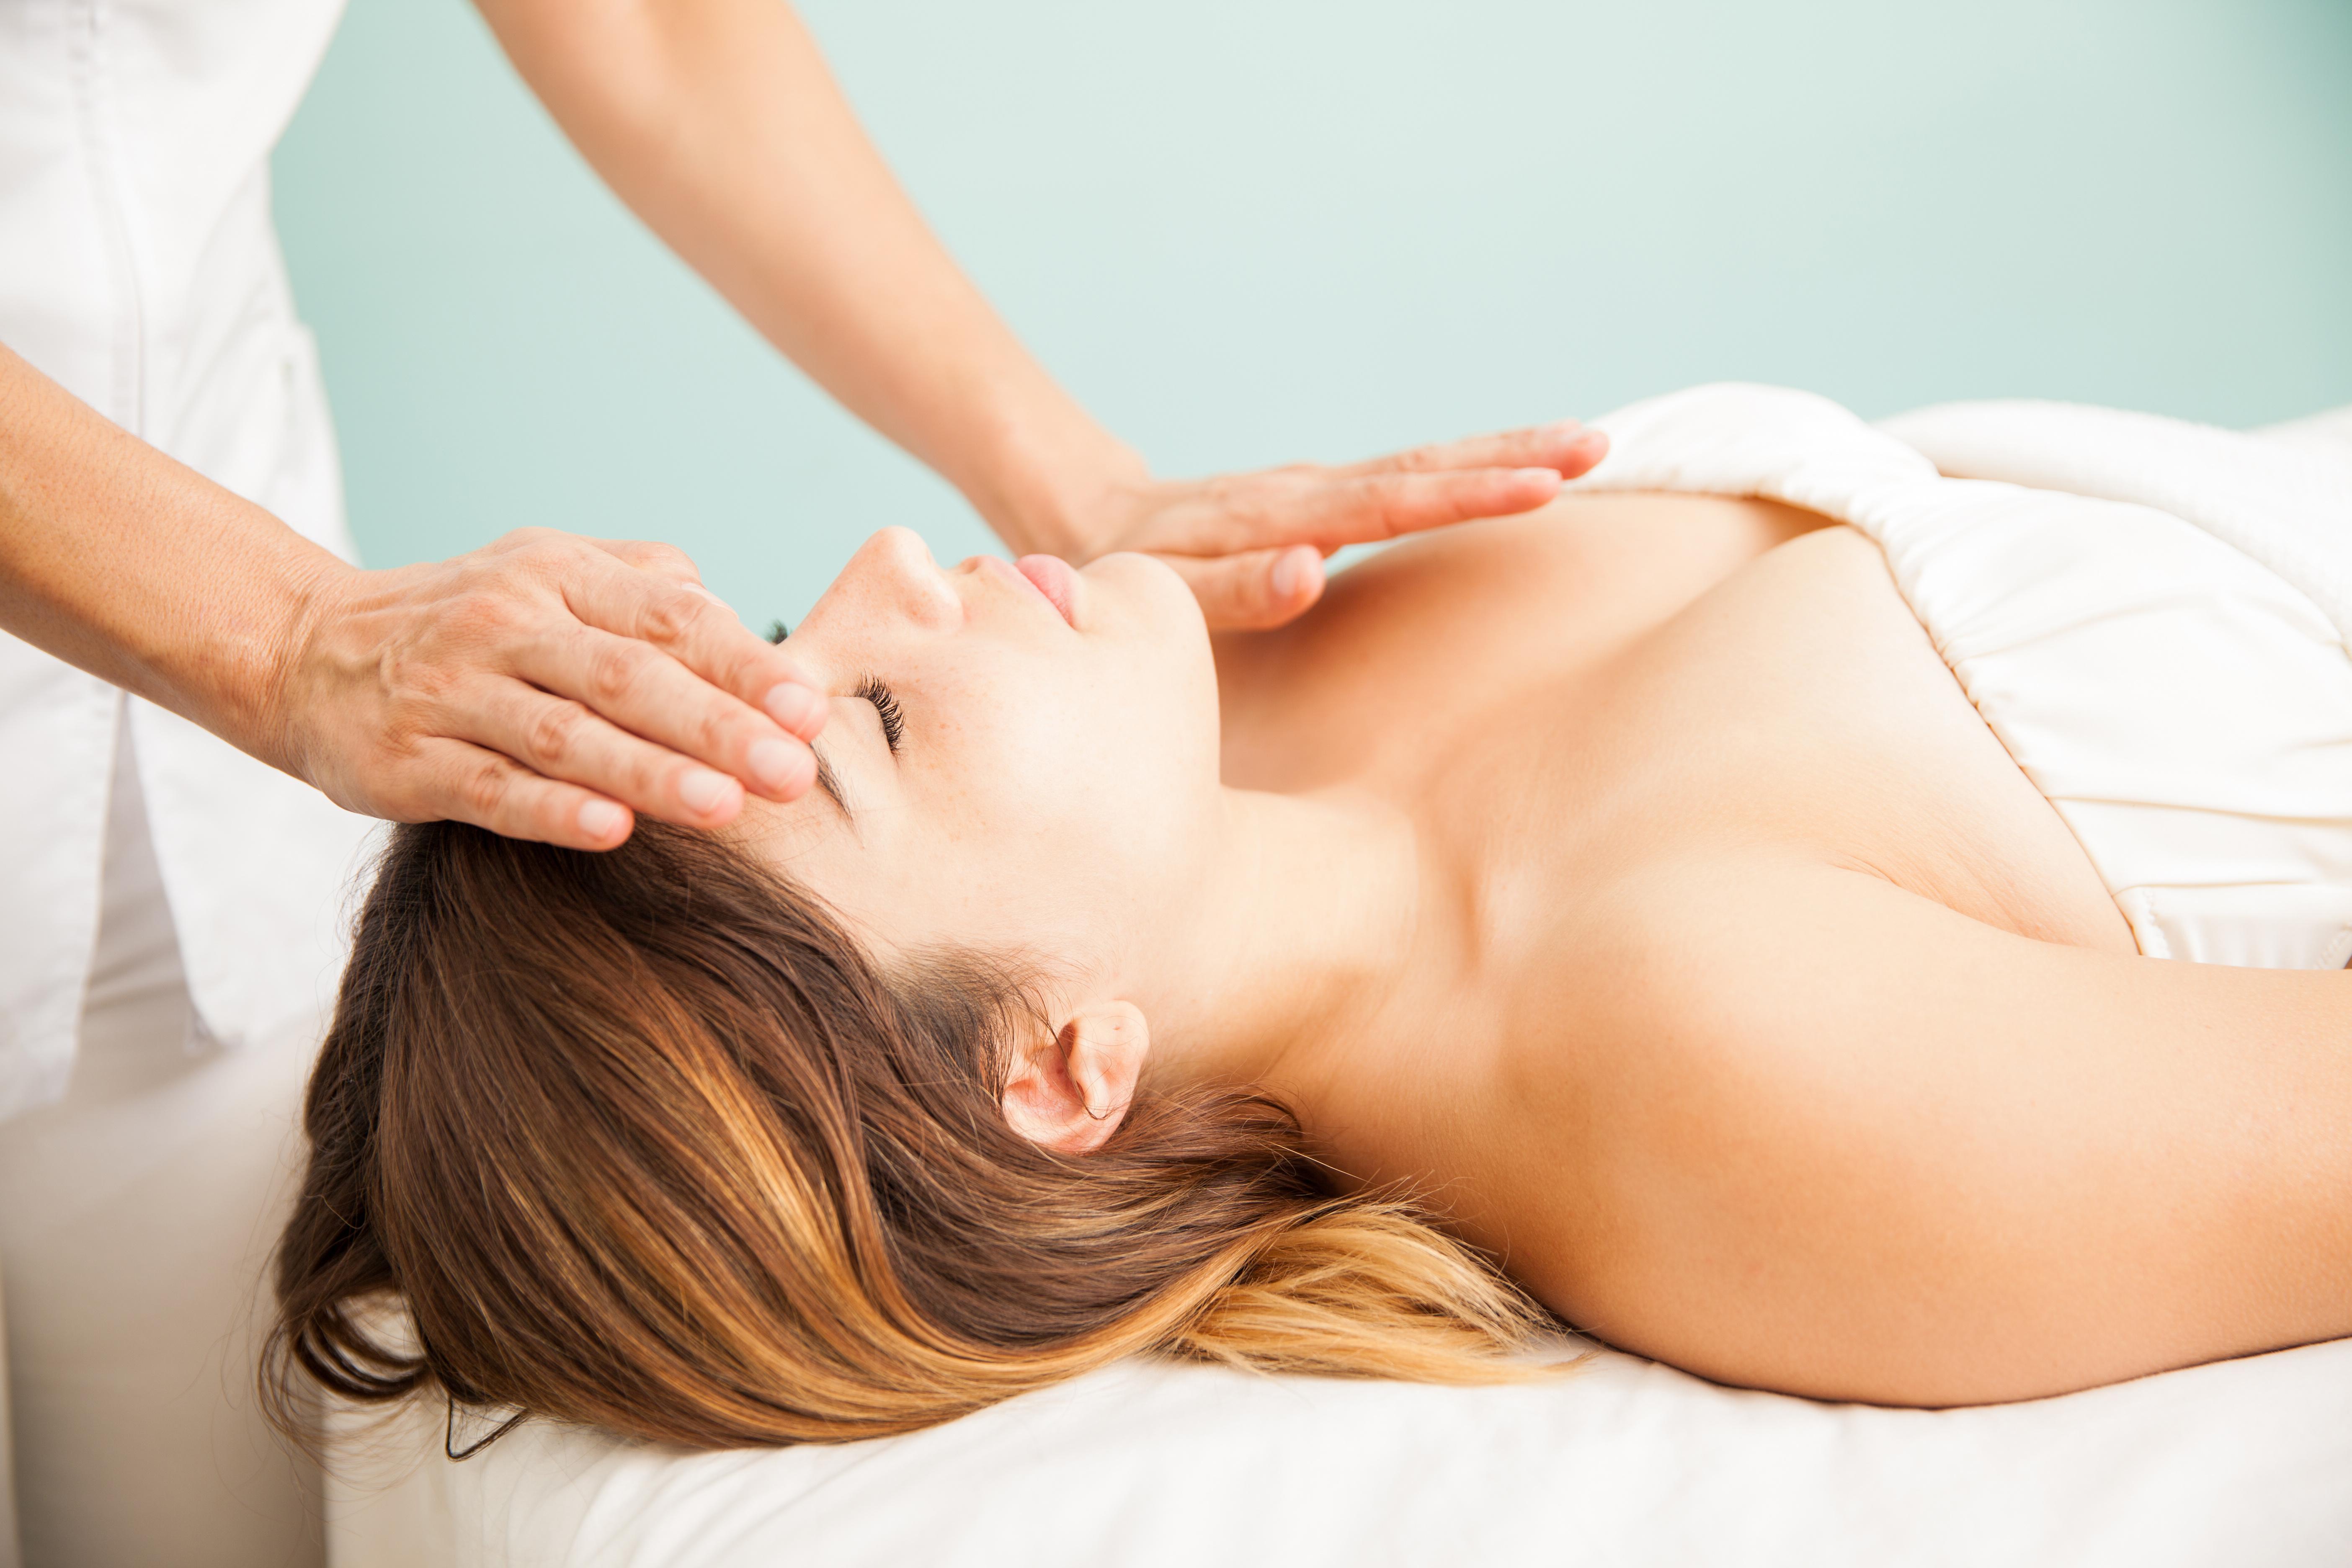 woman-spa-massage-relaxing-swiss-mountain-clinic-healing-switzerland-europe.jpg